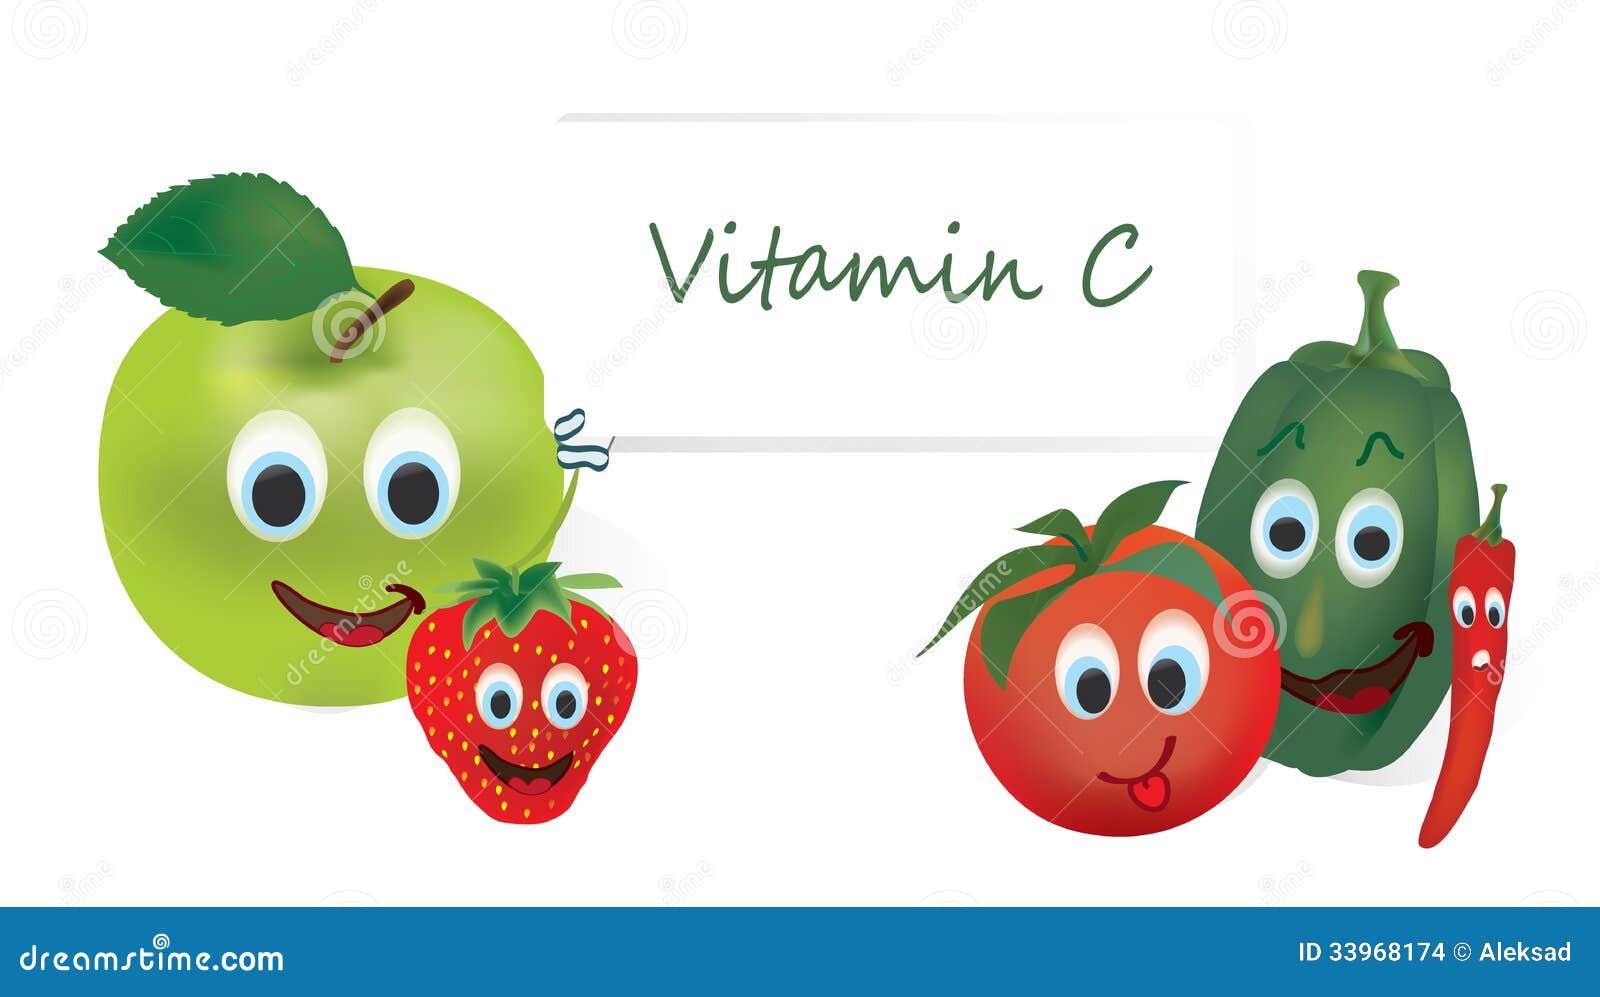 Imagenes Vitamina C Blackhairstylecuts Com